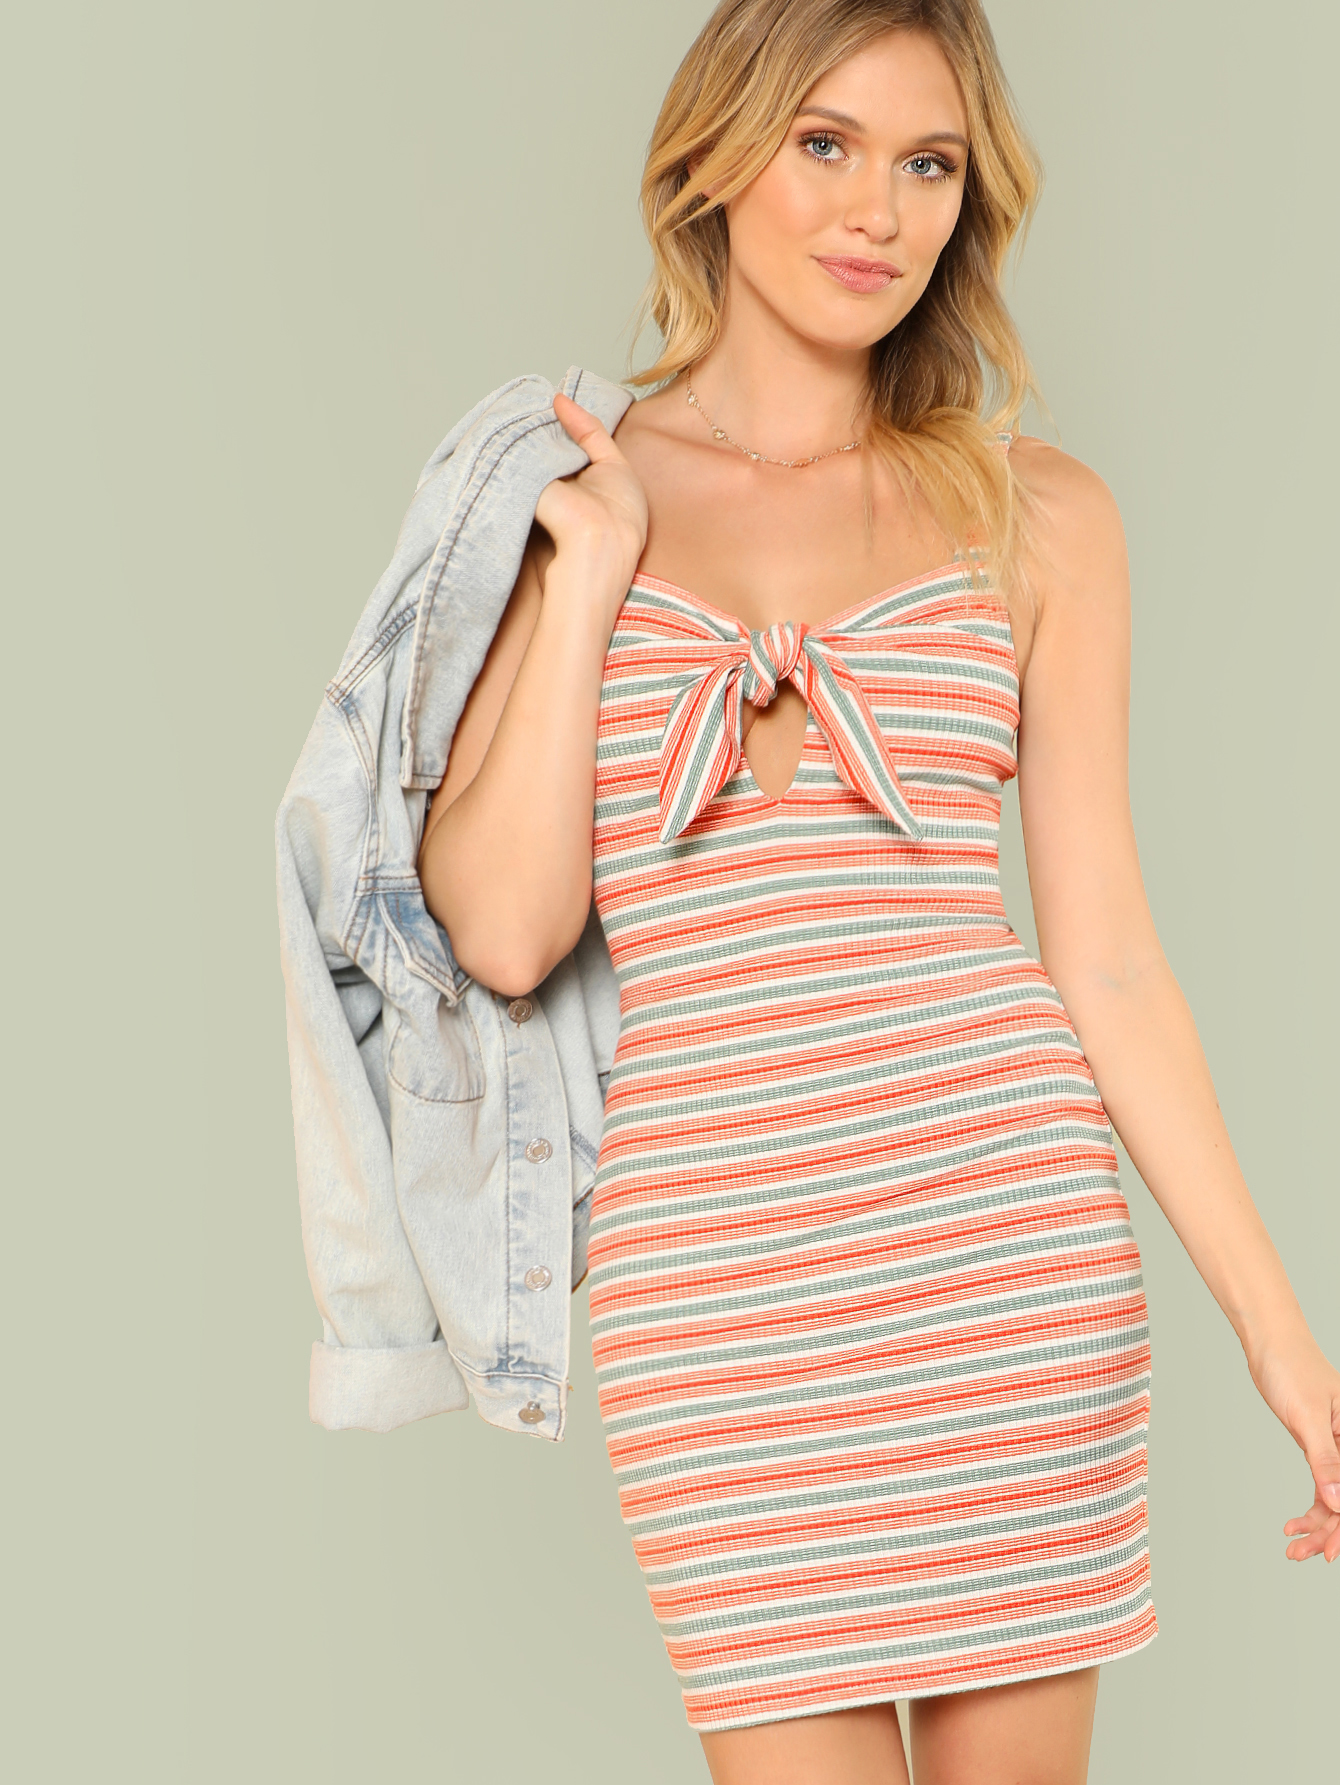 Cutout Knot Front Rib Knit Striped Dress cutout front rib knit t shirt